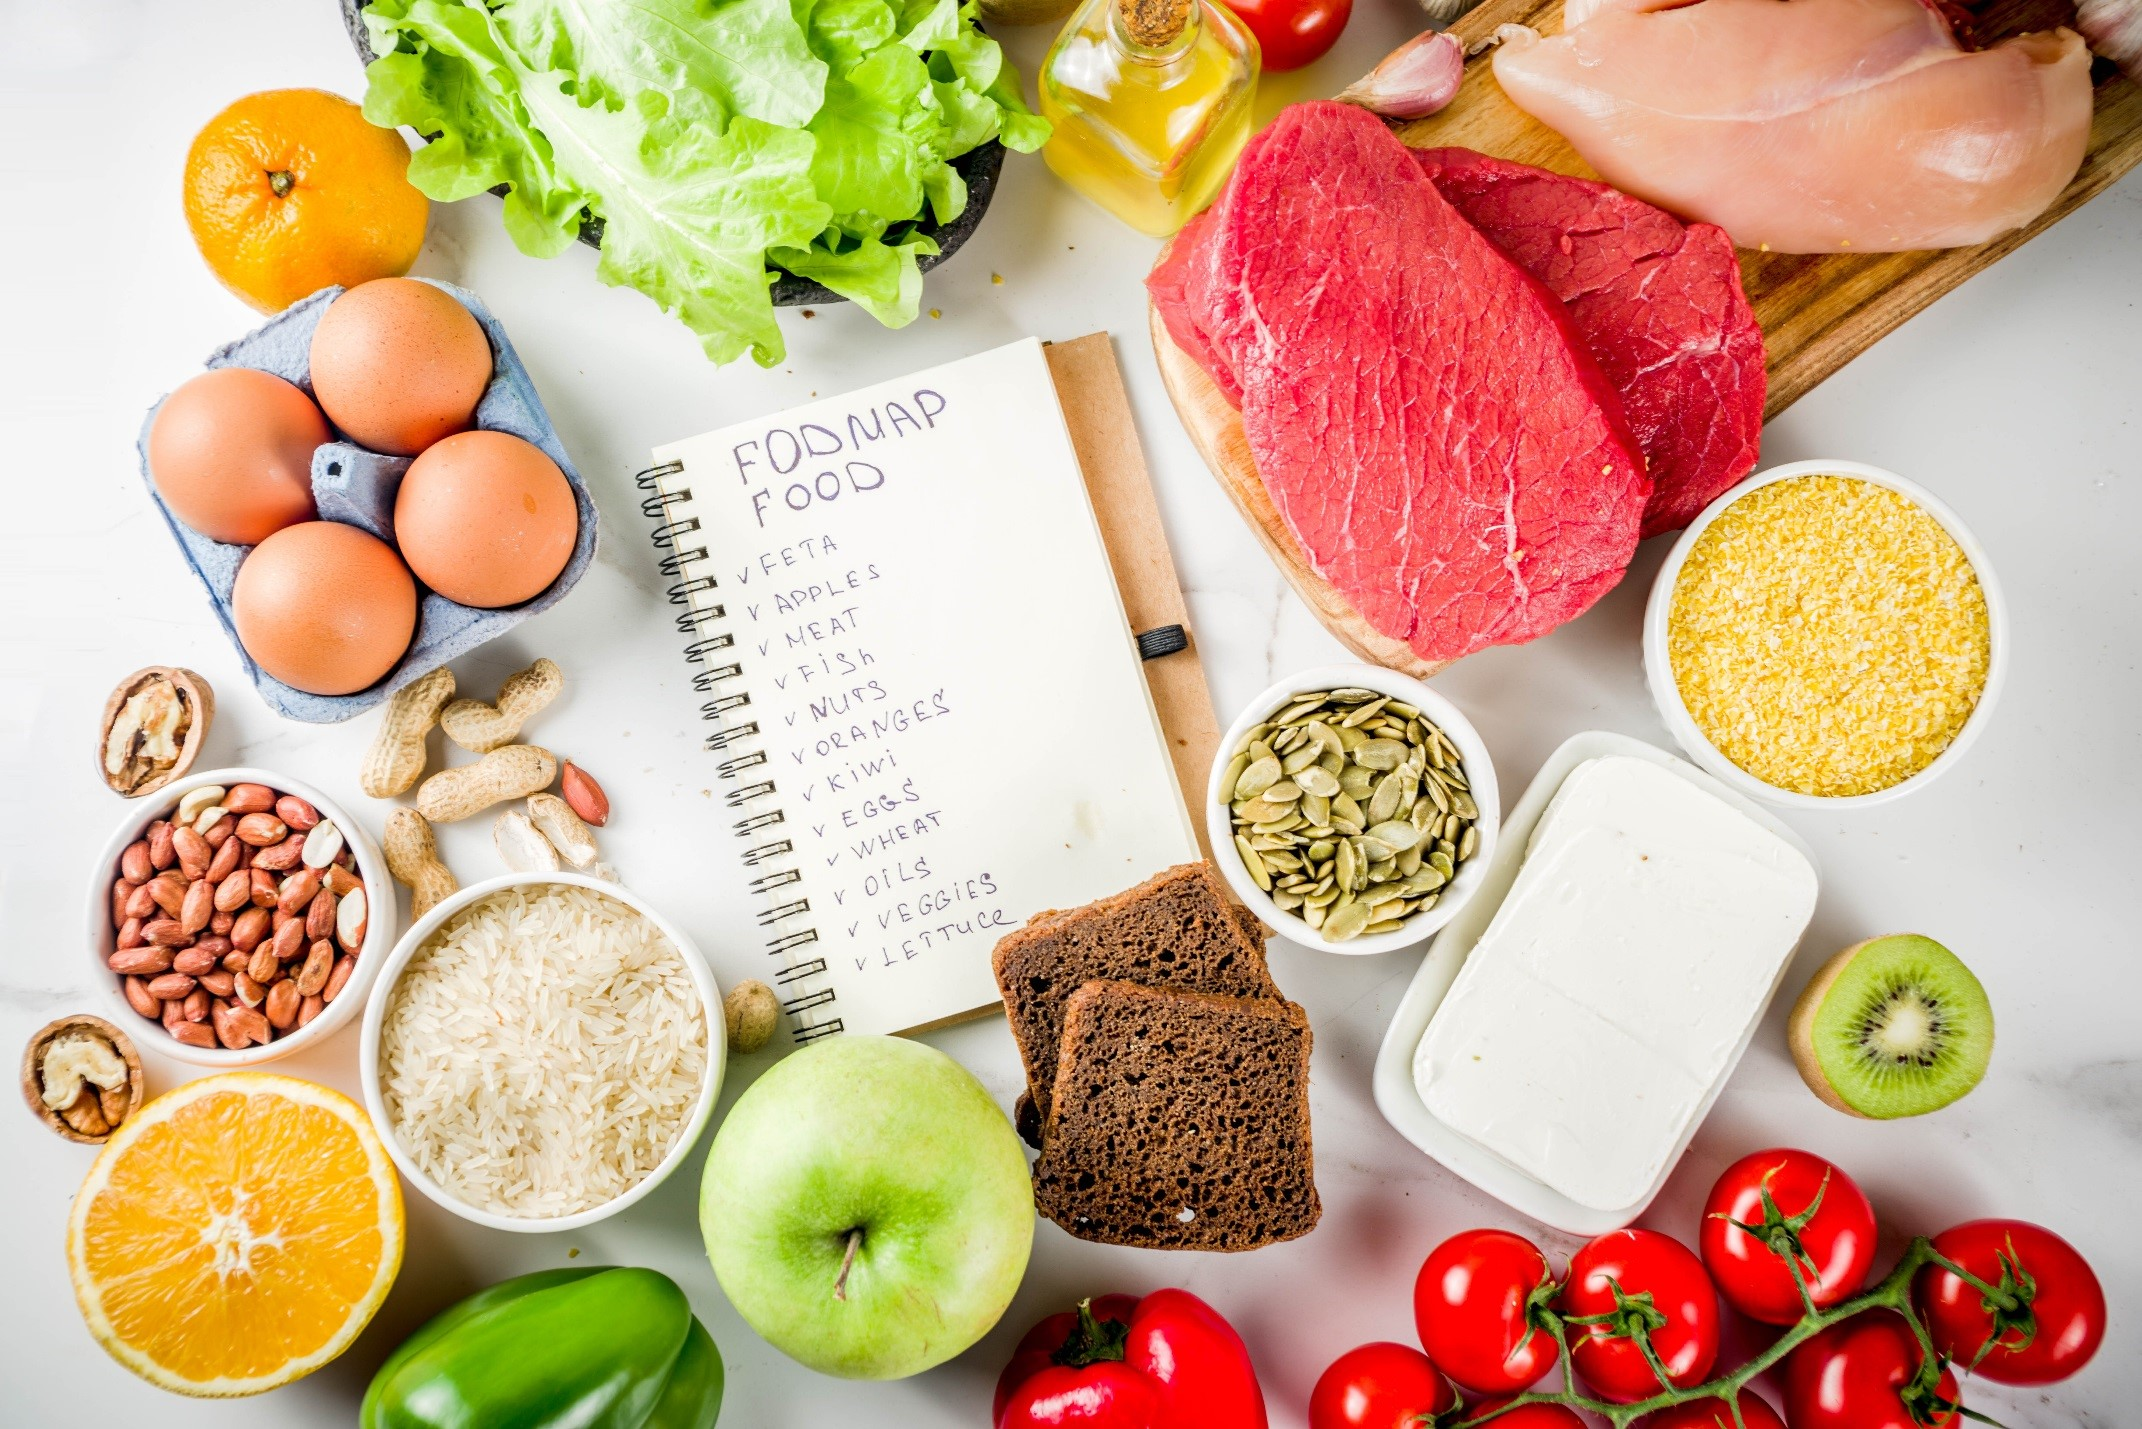 basis of low fodmap diet